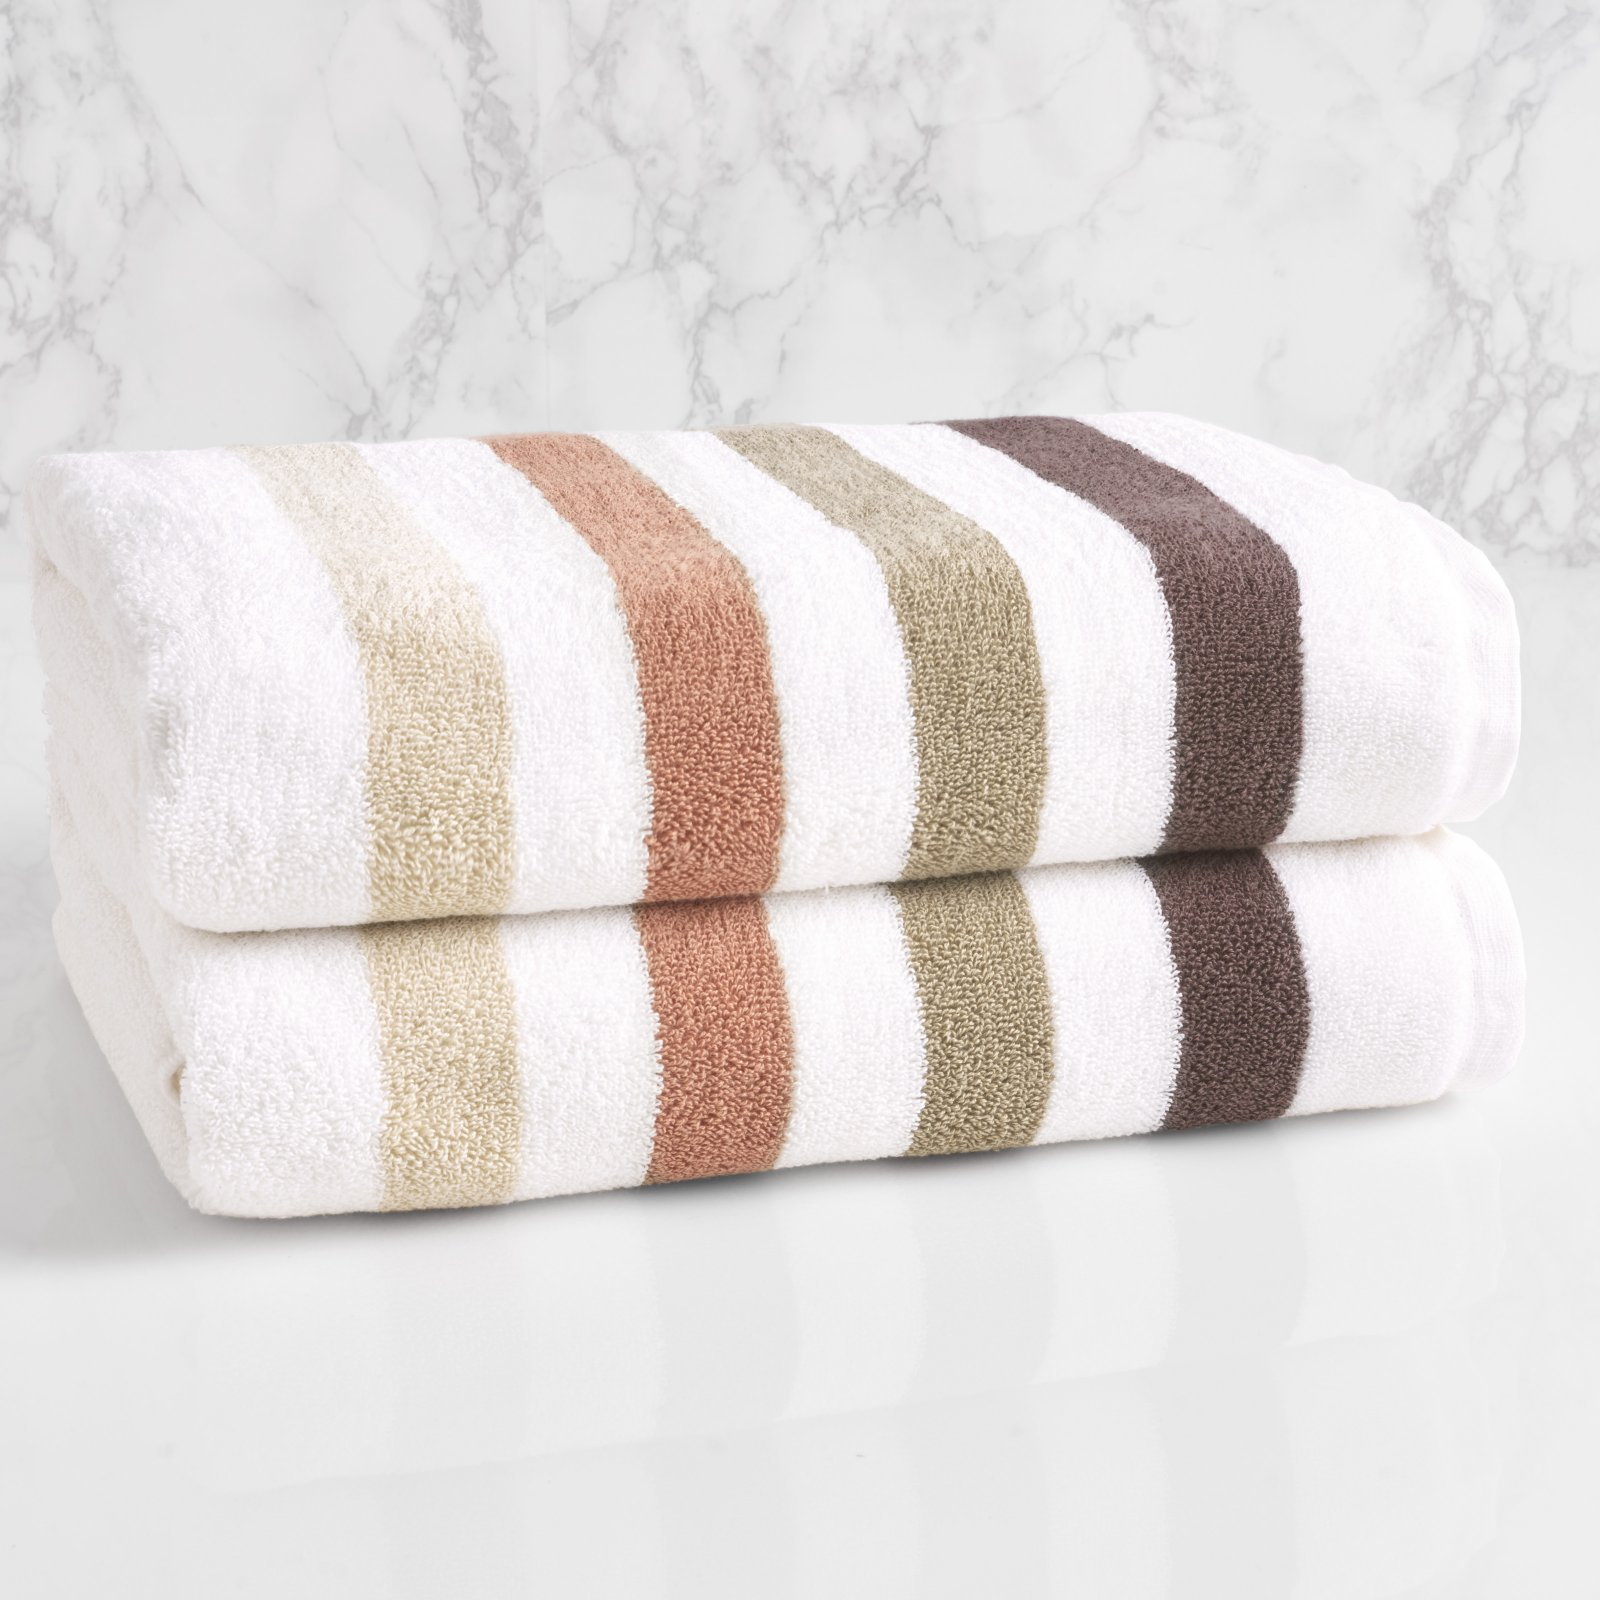 LOFT by Loftex Bars Cotton Bath Towel by Overstock